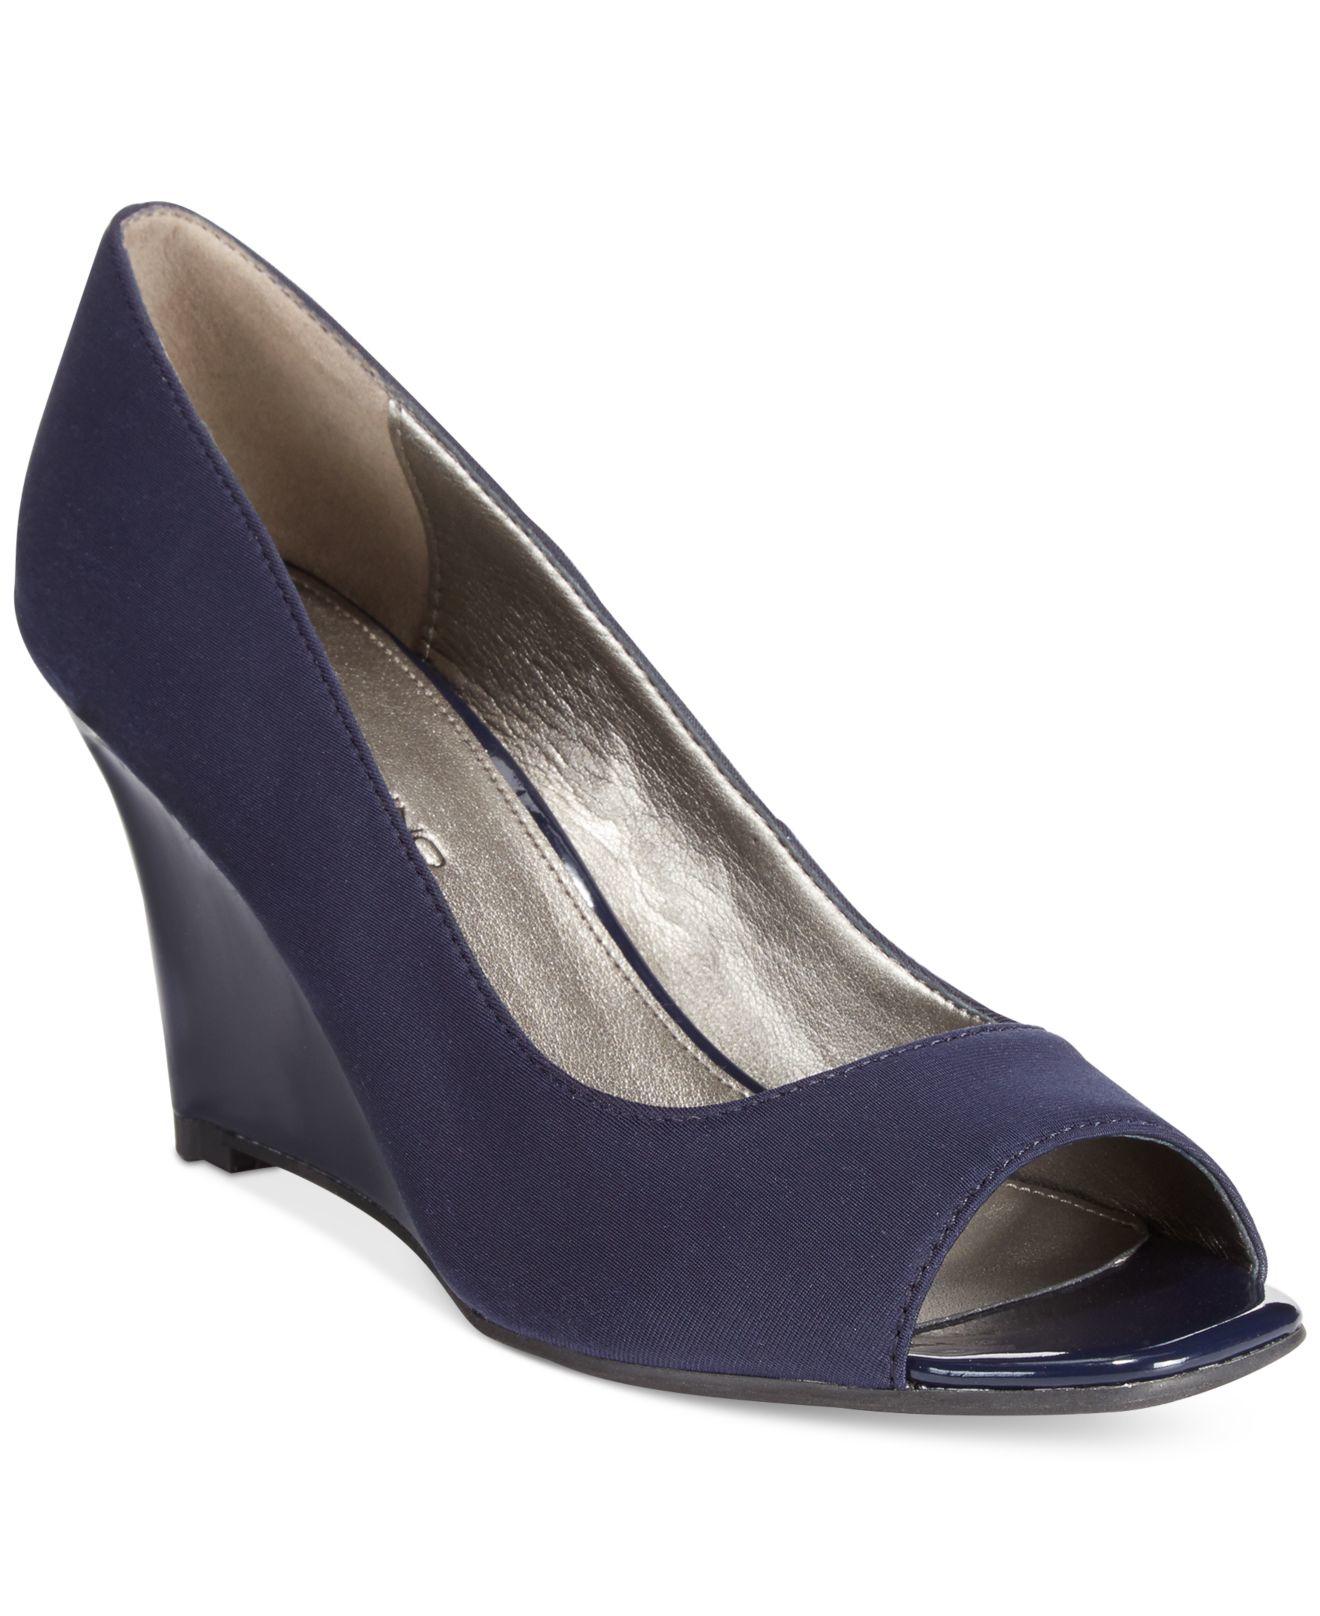 a93172479d1 Lyst - Bandolino Jamila Peep-toe Pumps in Blue